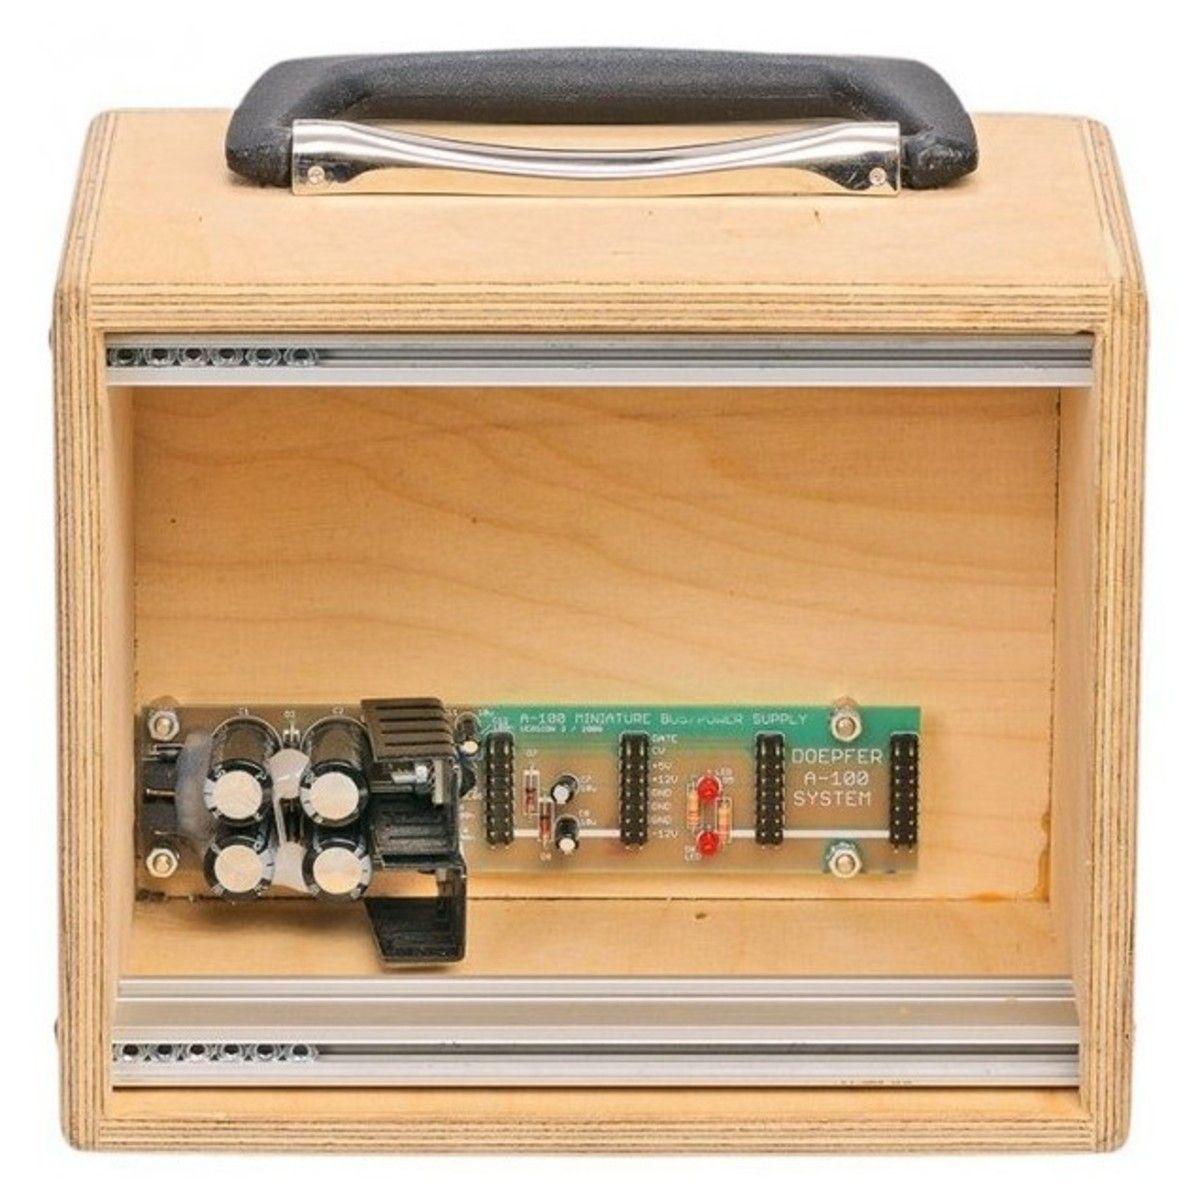 Doepfer A-100 MC Eurorack Compact Powered Case (3U - 32hp) RAW